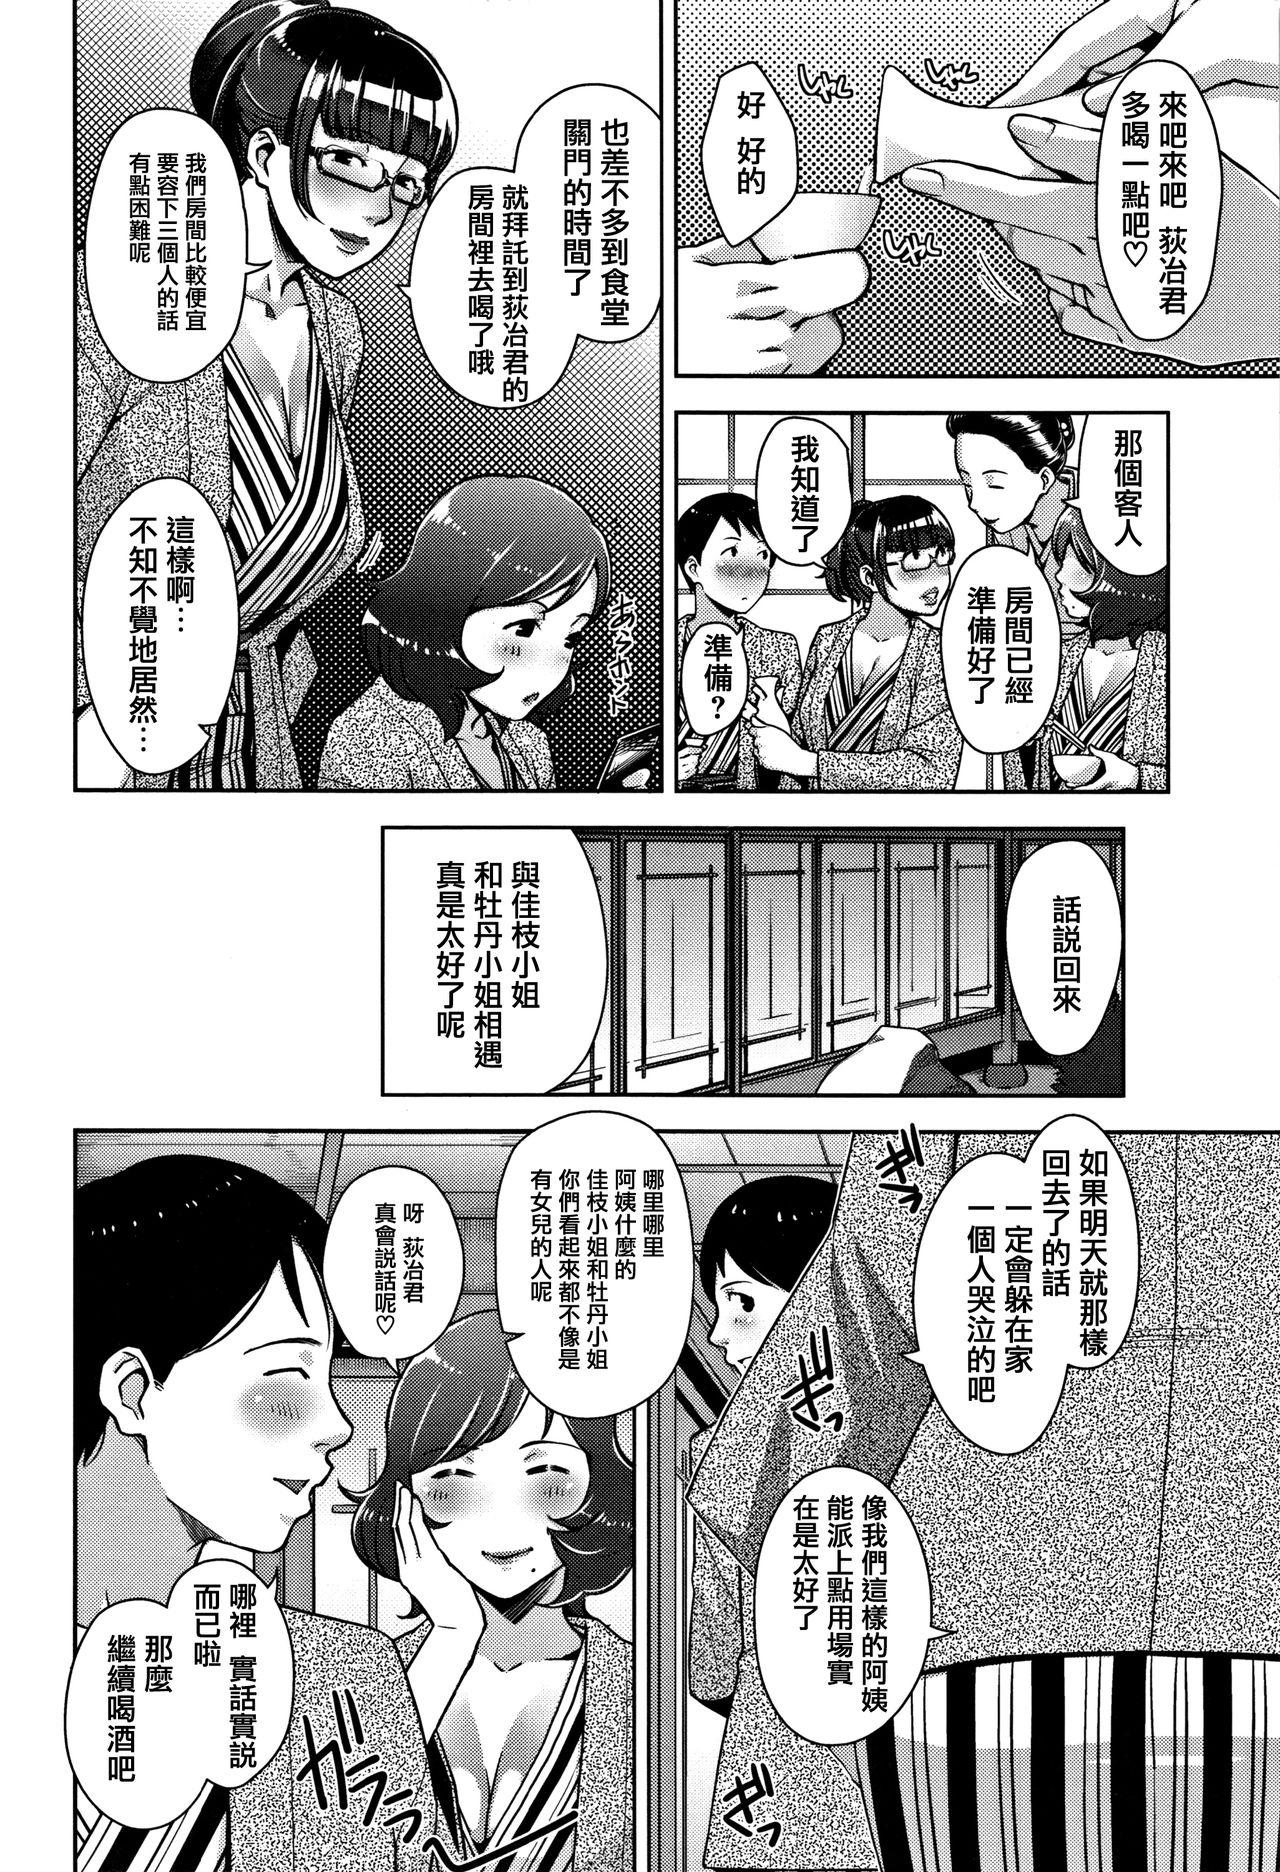 Kanjyuku Chijyo 73